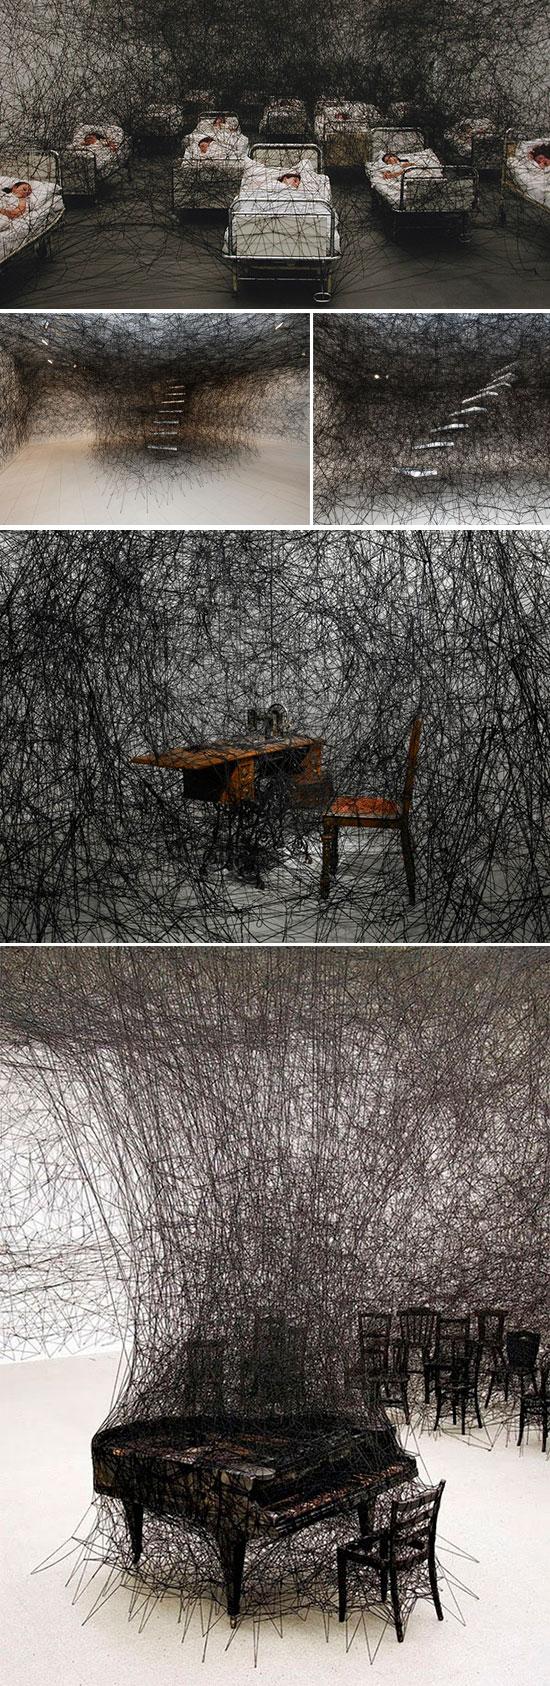 Thread installations by artist Chiharu Shiota